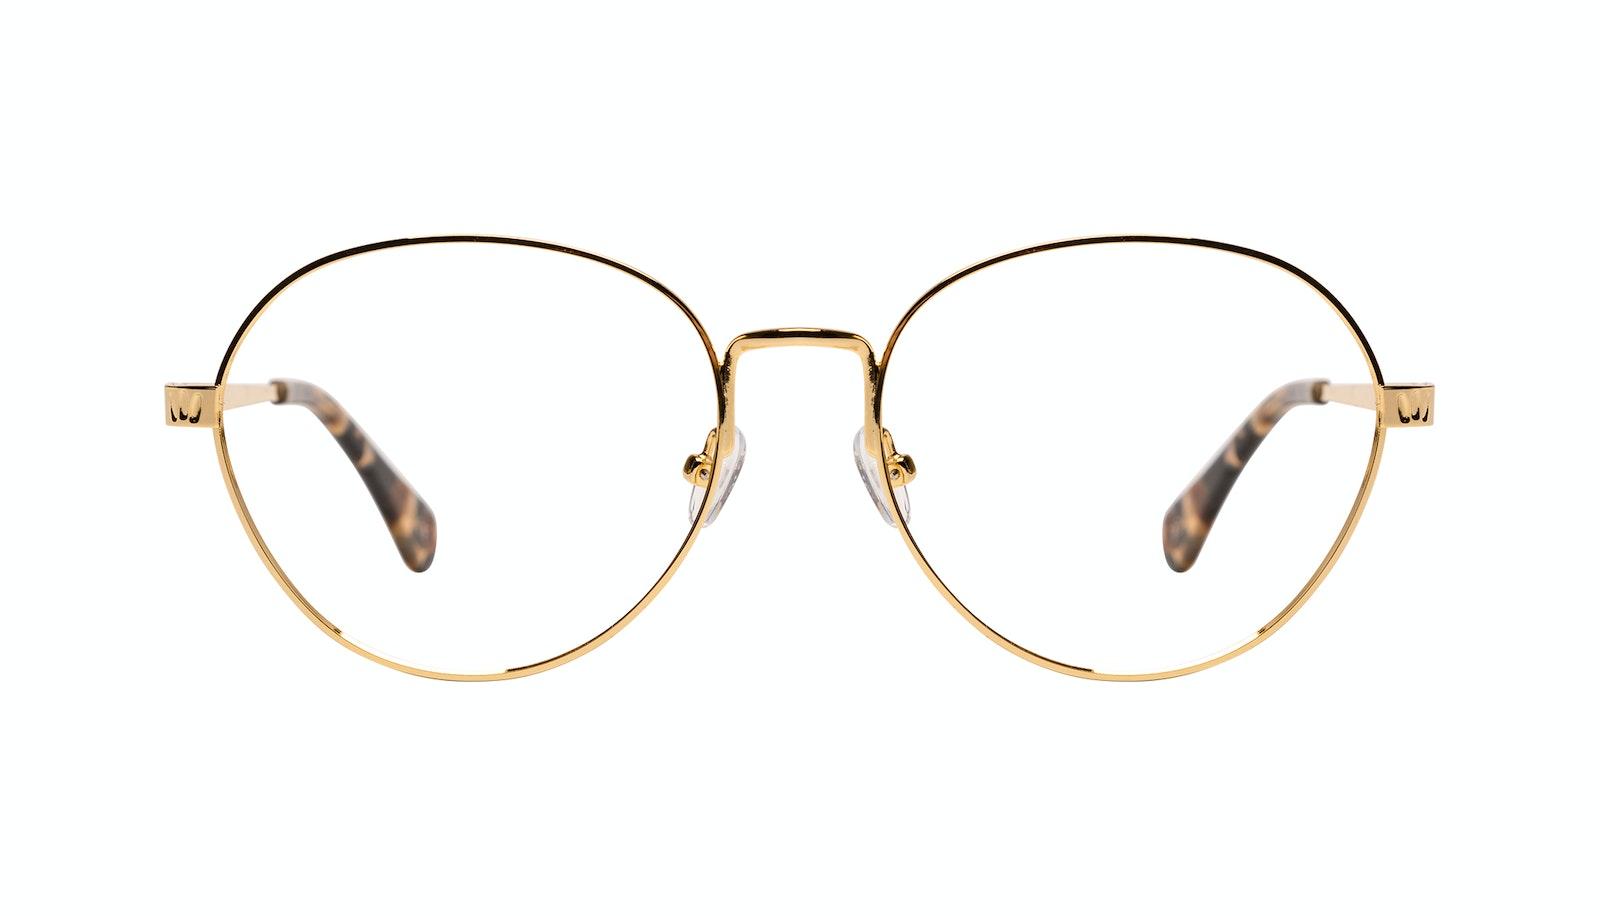 Affordable Fashion Glasses Round Eyeglasses Women Brace Plus Gold